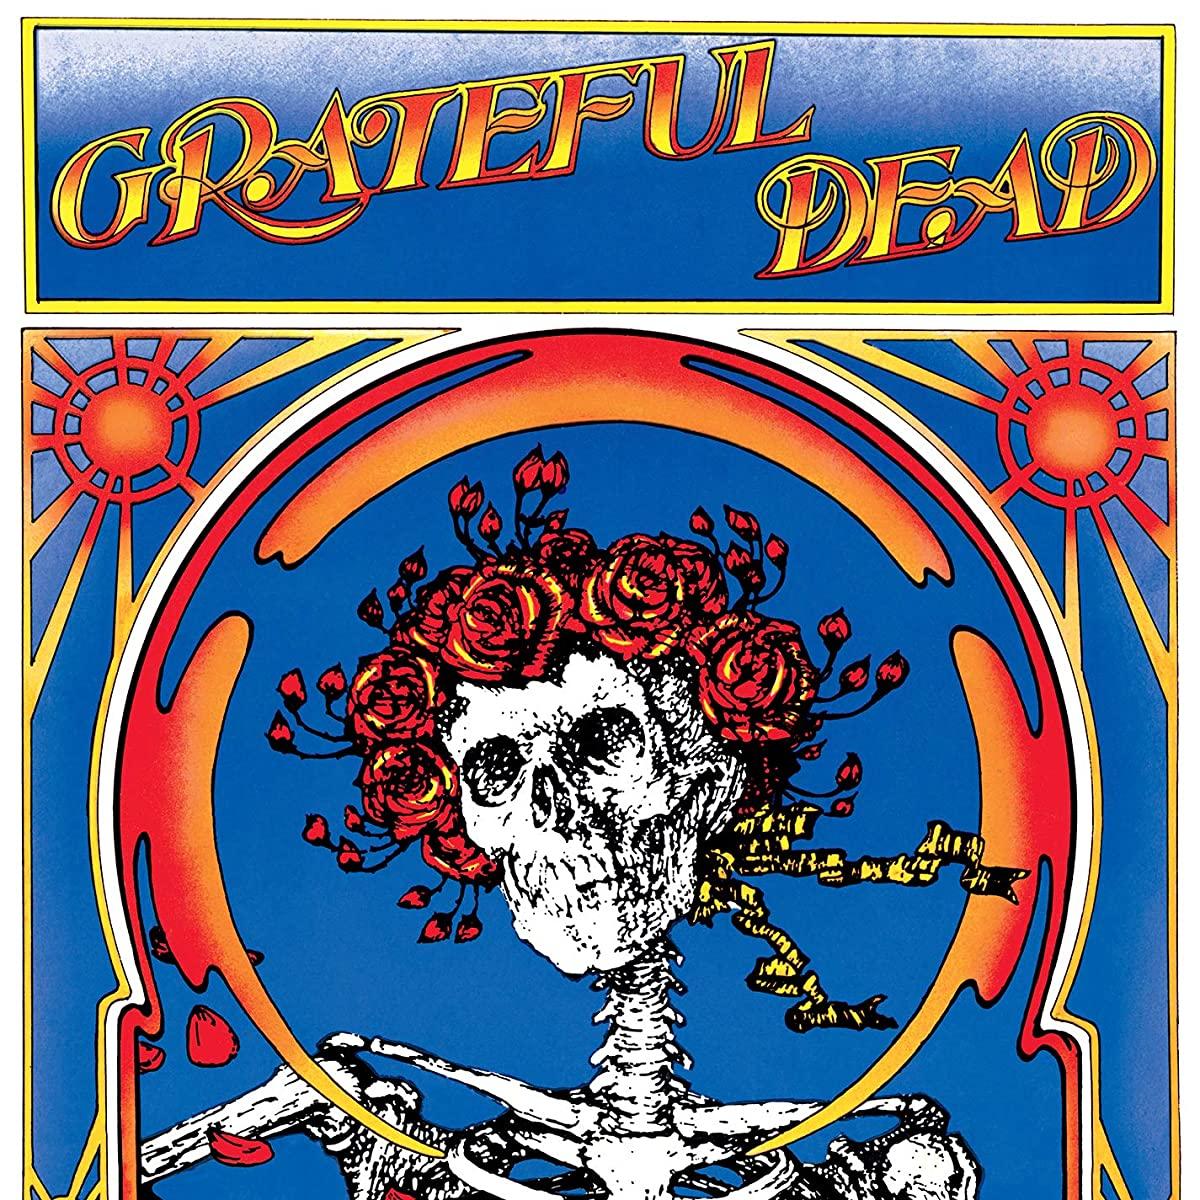 Grateful Dead Skull Andamp Roses Live Expanded Edition by Grateful Dead